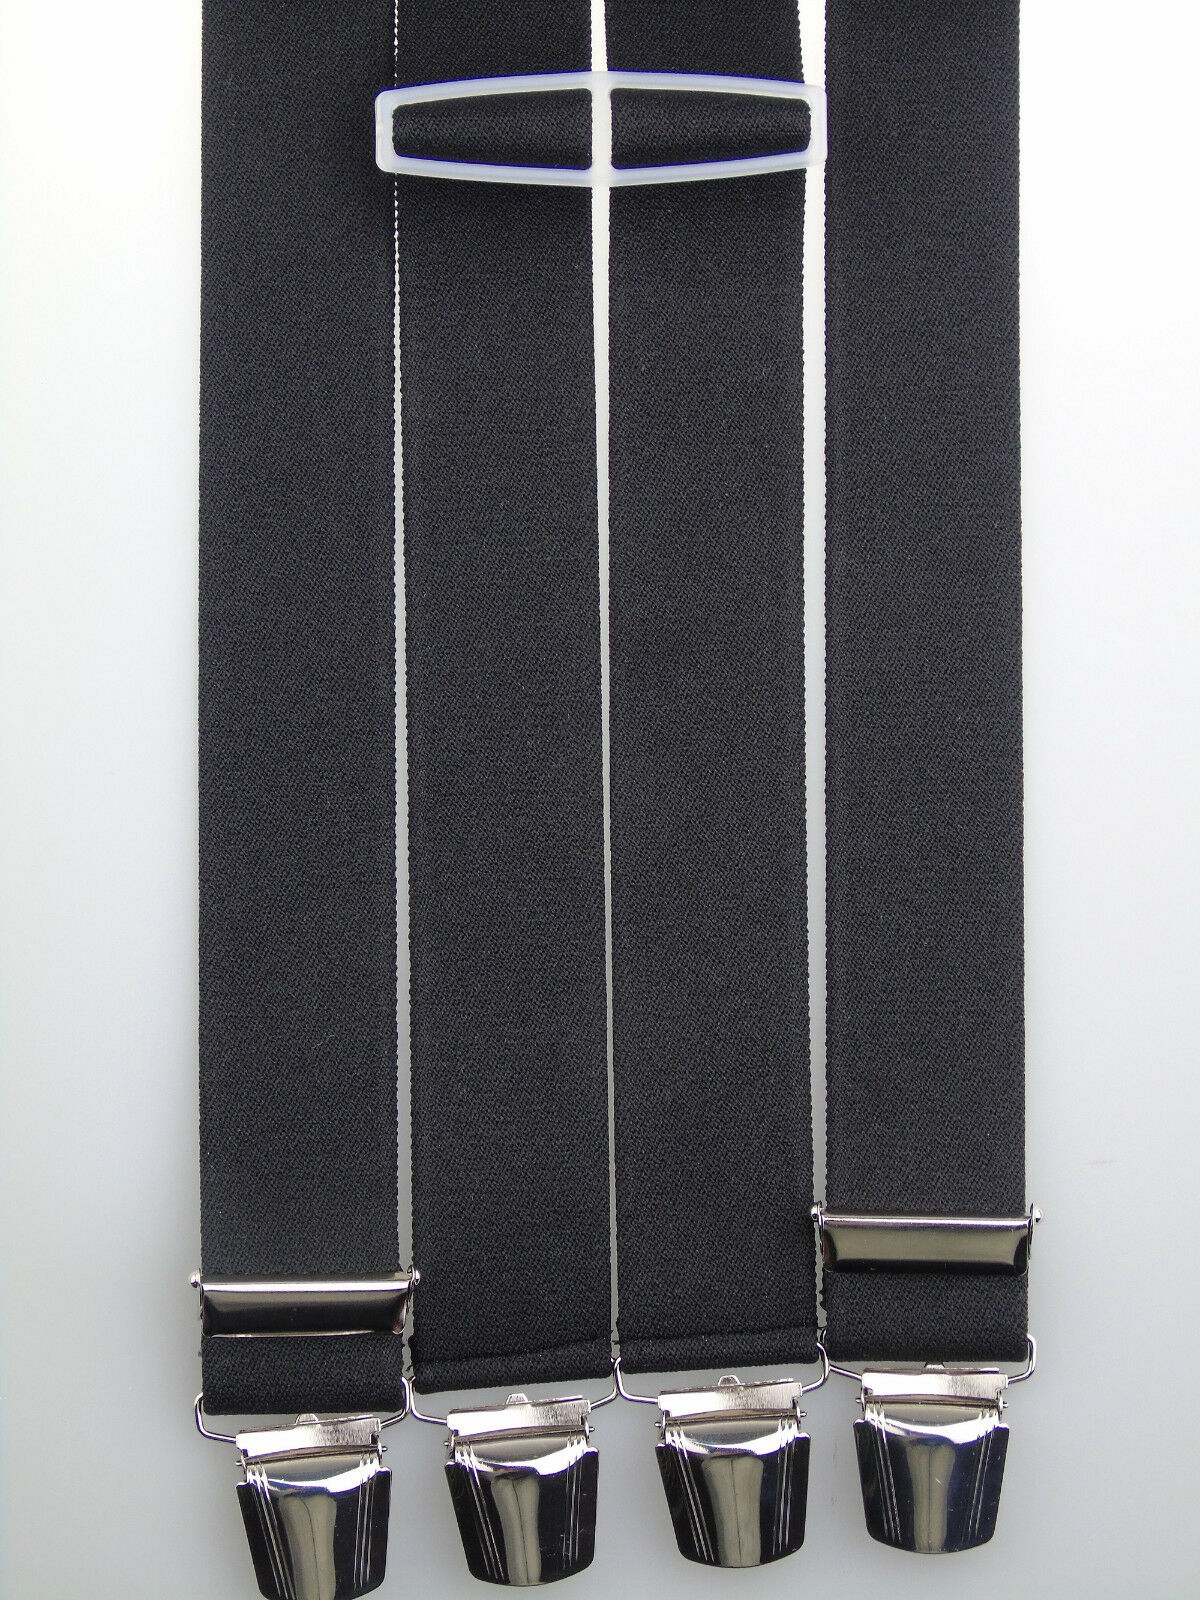 extra starke Hosenträger 35 mm breit versch. Farben wählen starke Clips